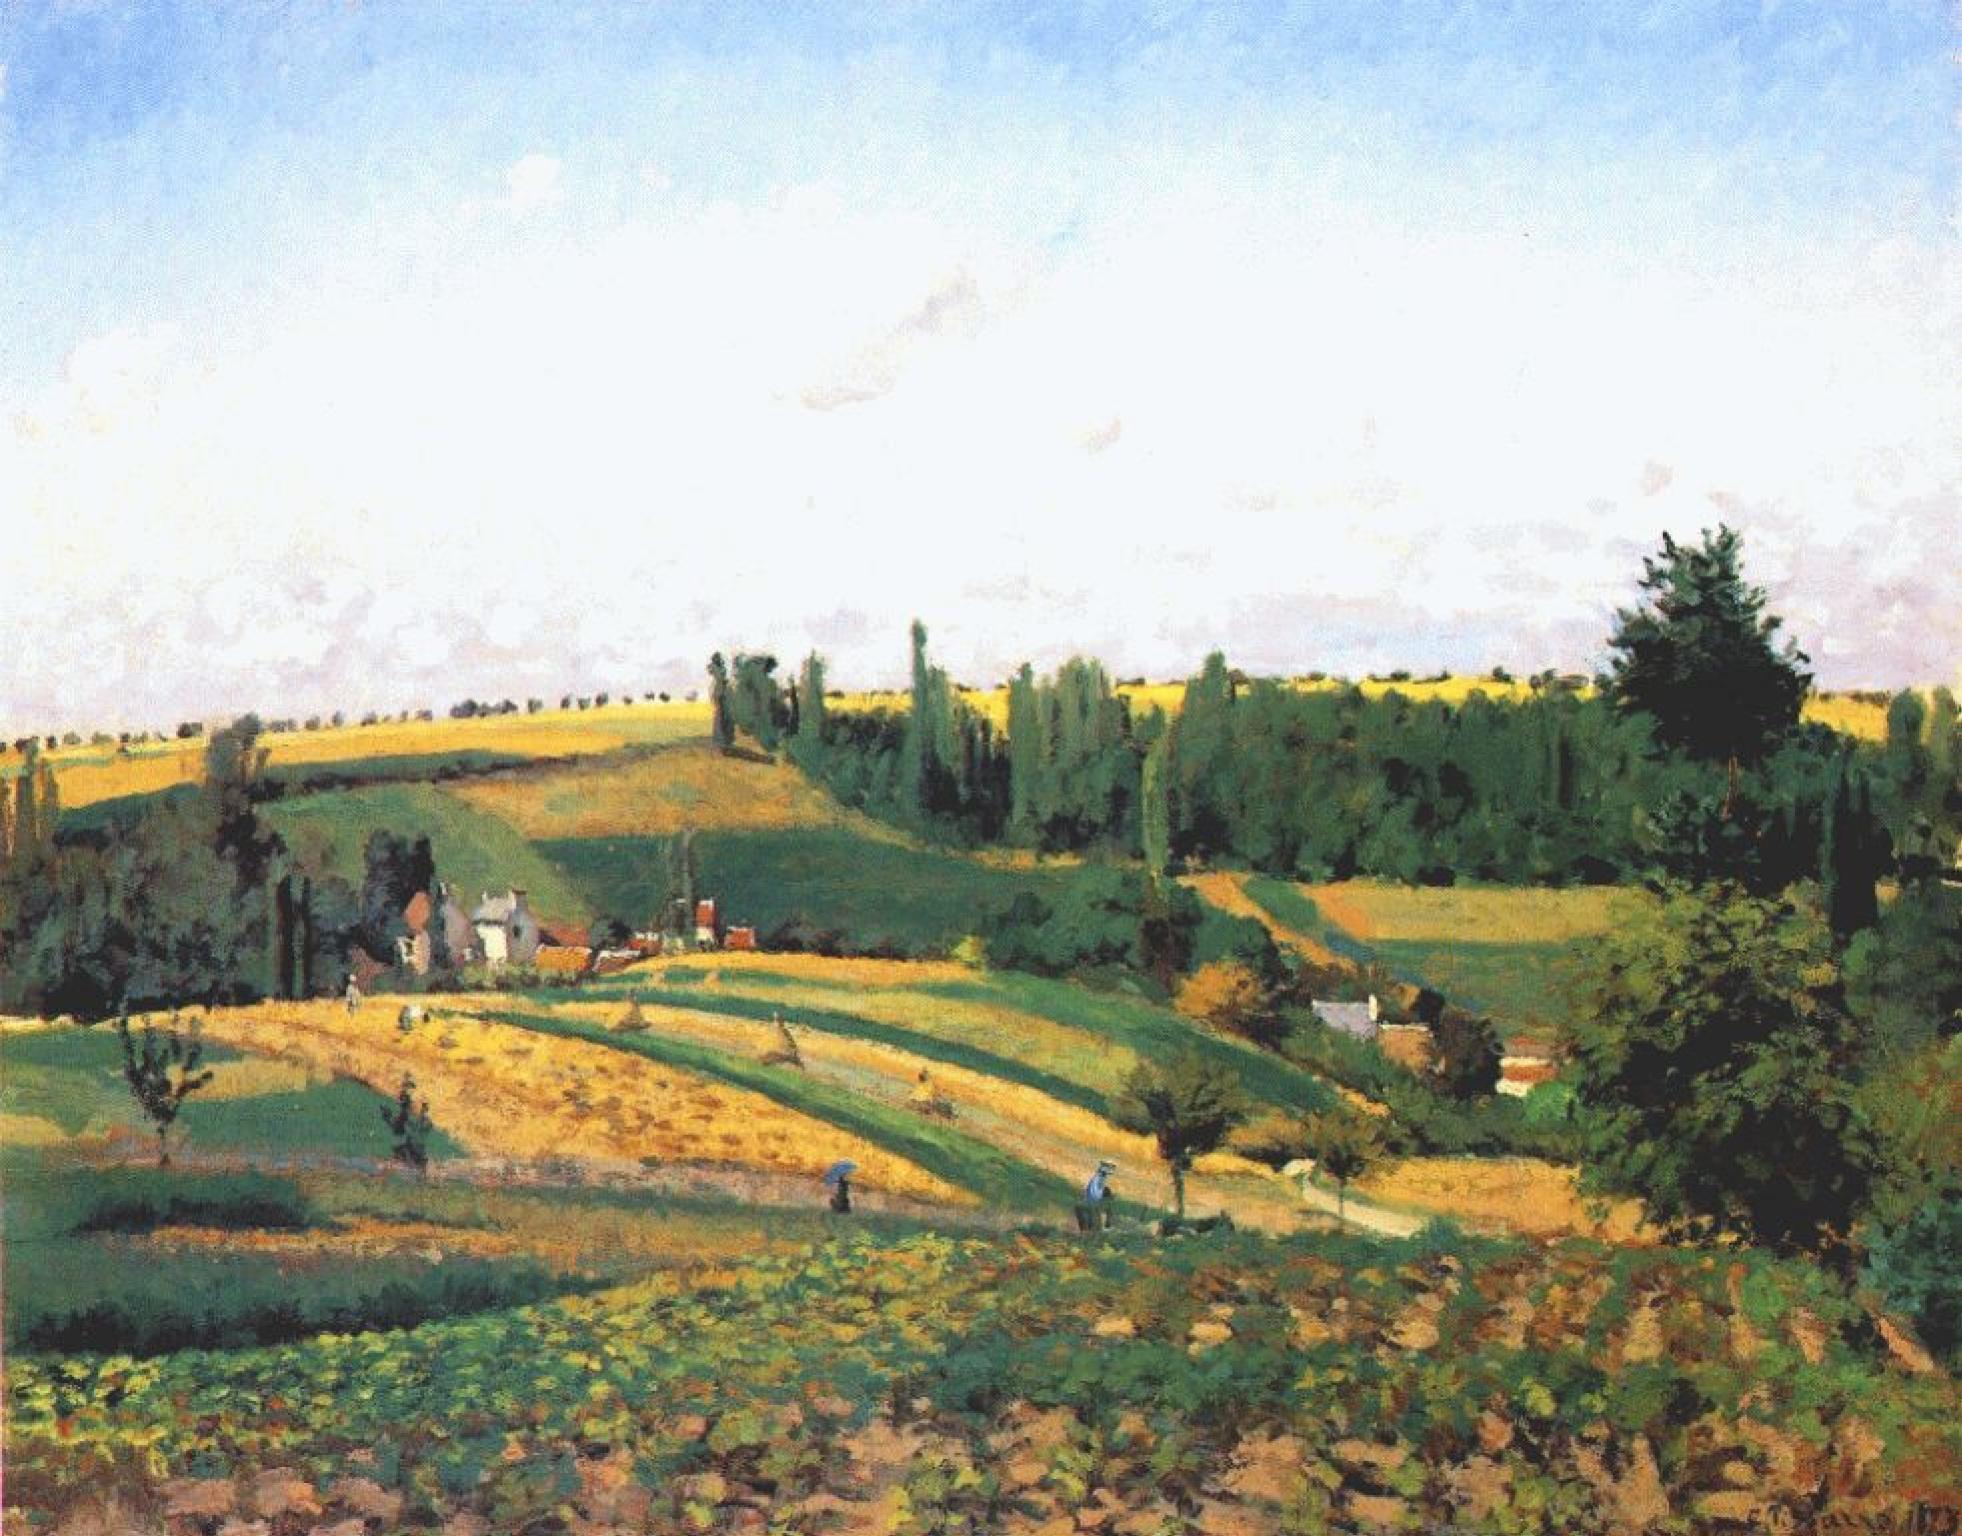 Камиль Писсарро. Пейзаж со сбором урожая в Понтуазе